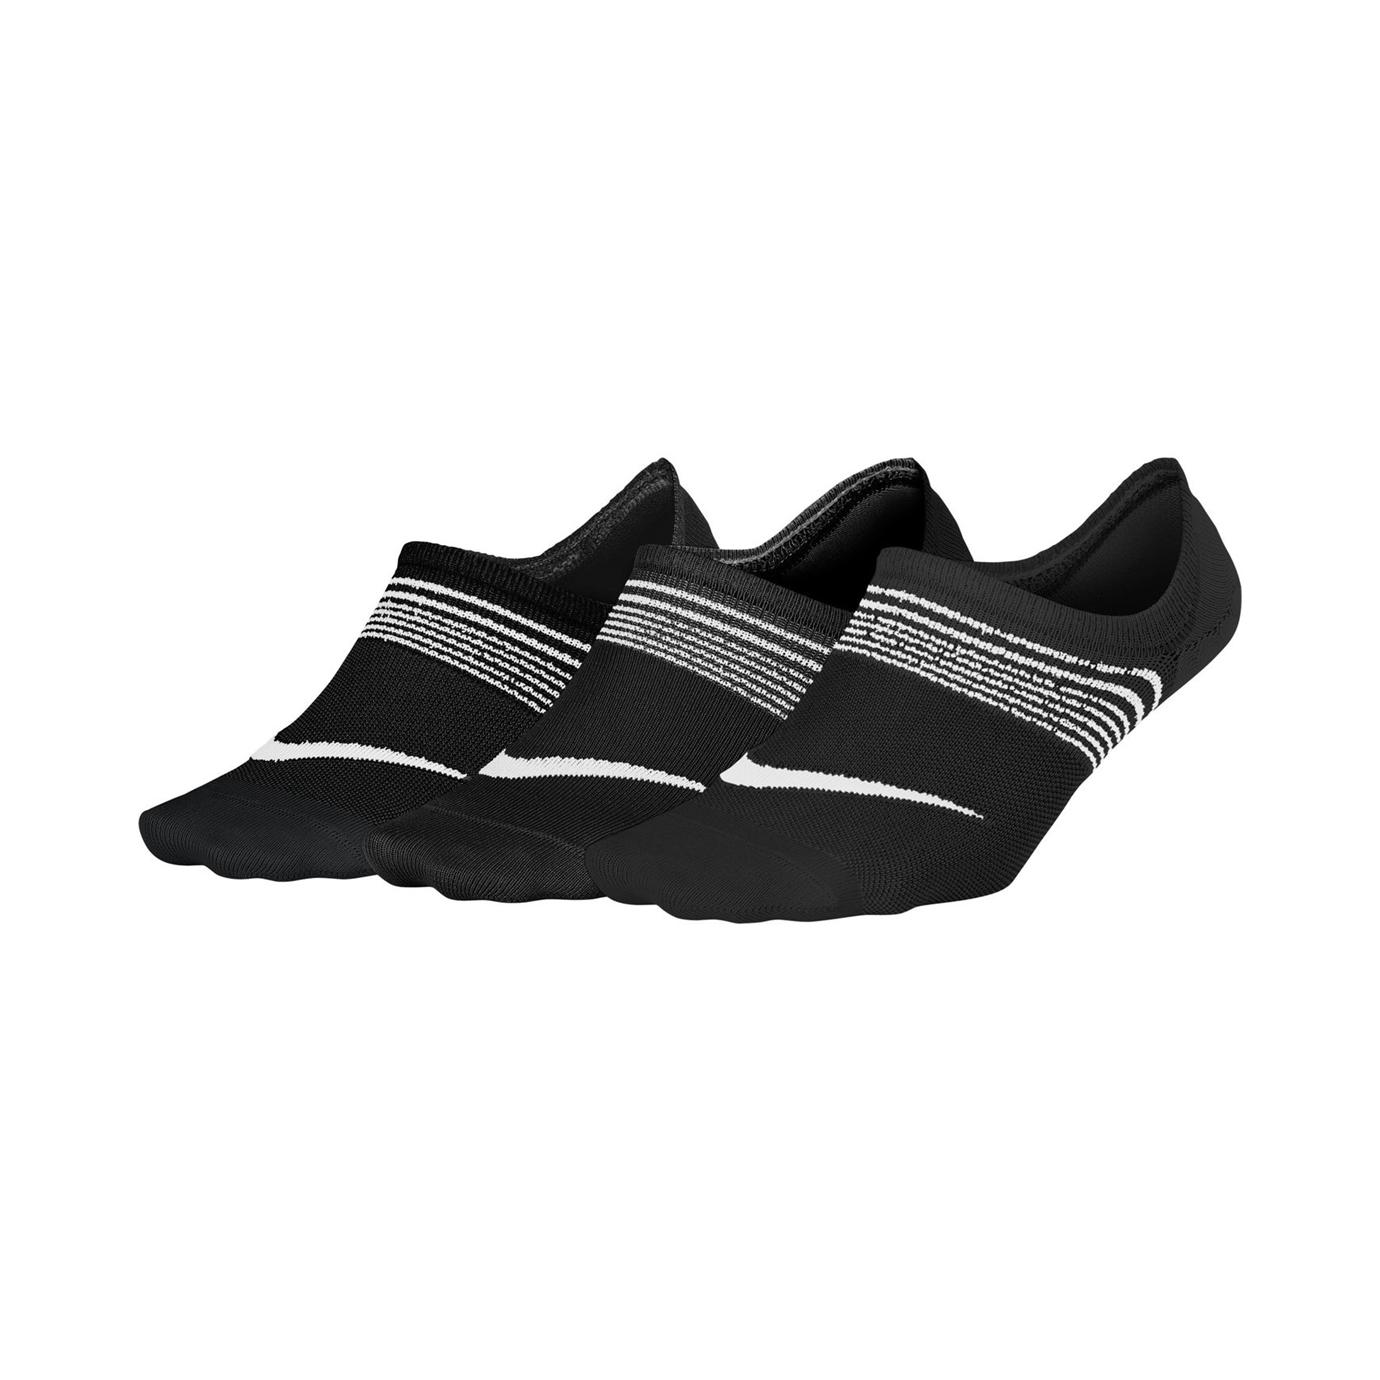 Nike Womens Everyday Plus Lightweight Training Socks 3-pack M (38-42)